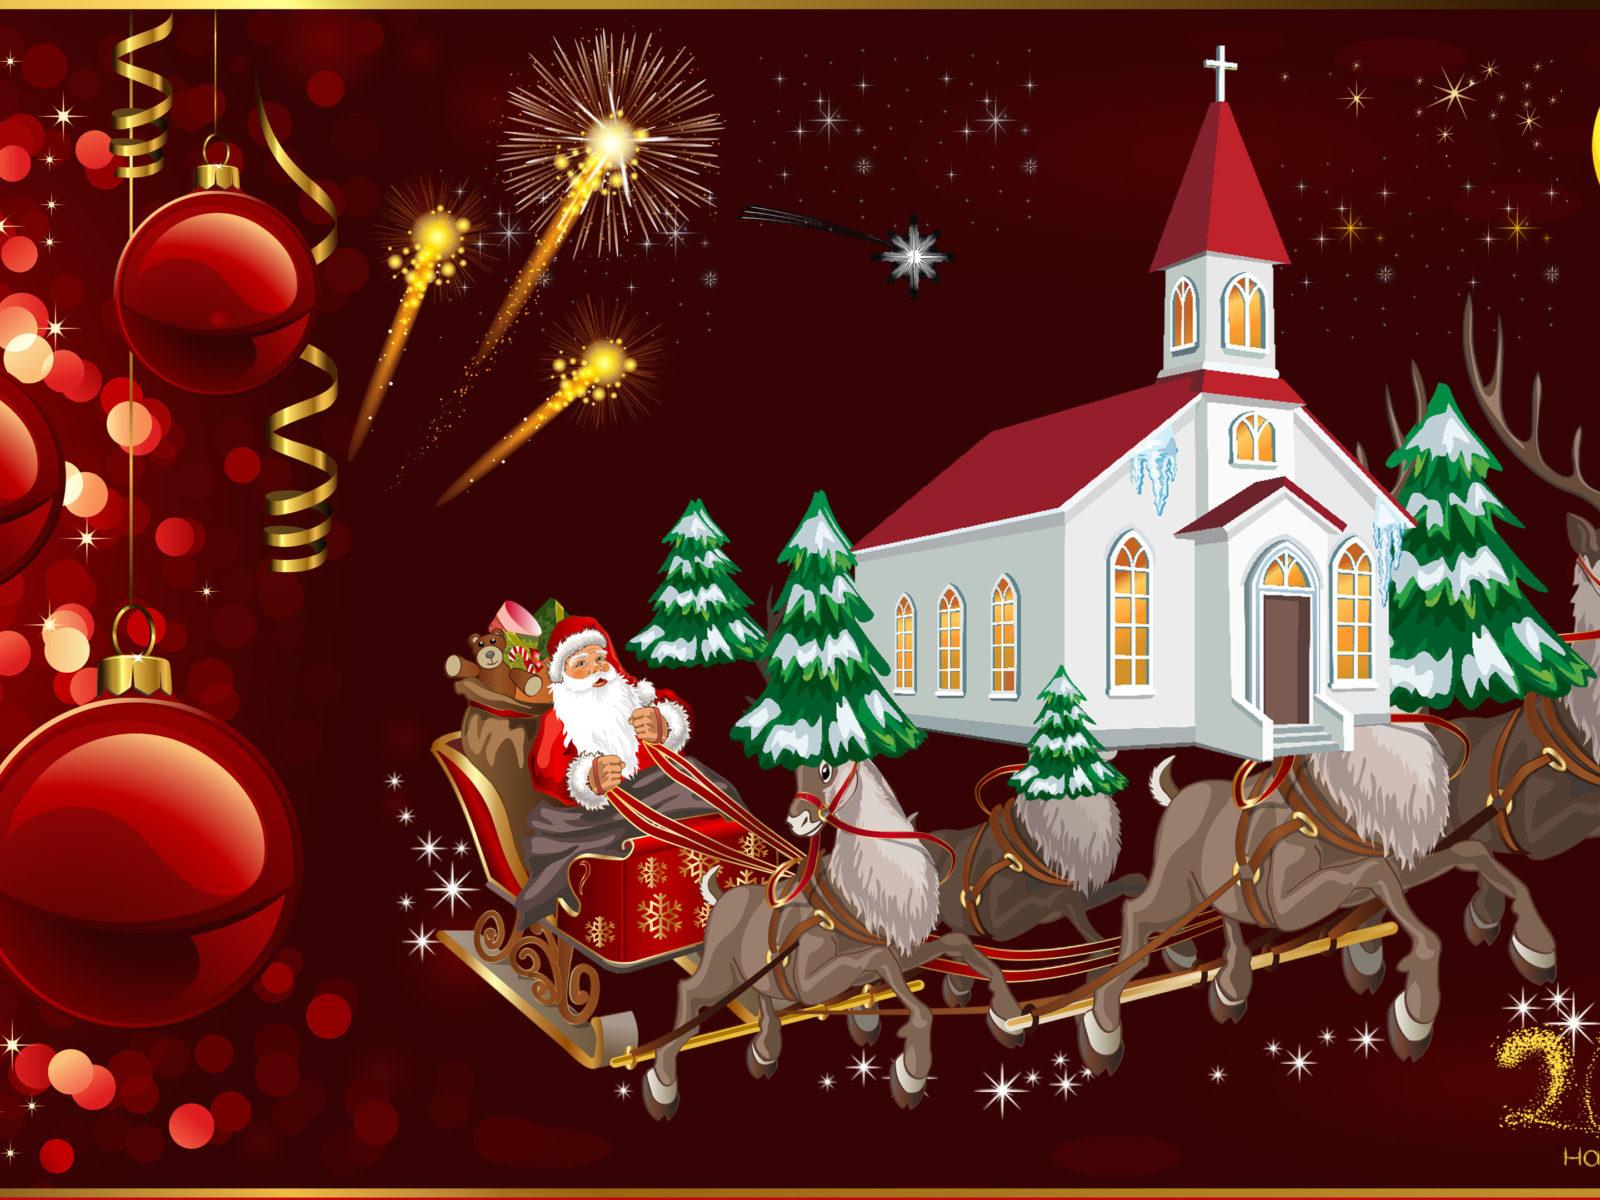 Happy New Year 2020 Merry Christmas Christmas Greeting Card Santa 1600x1200